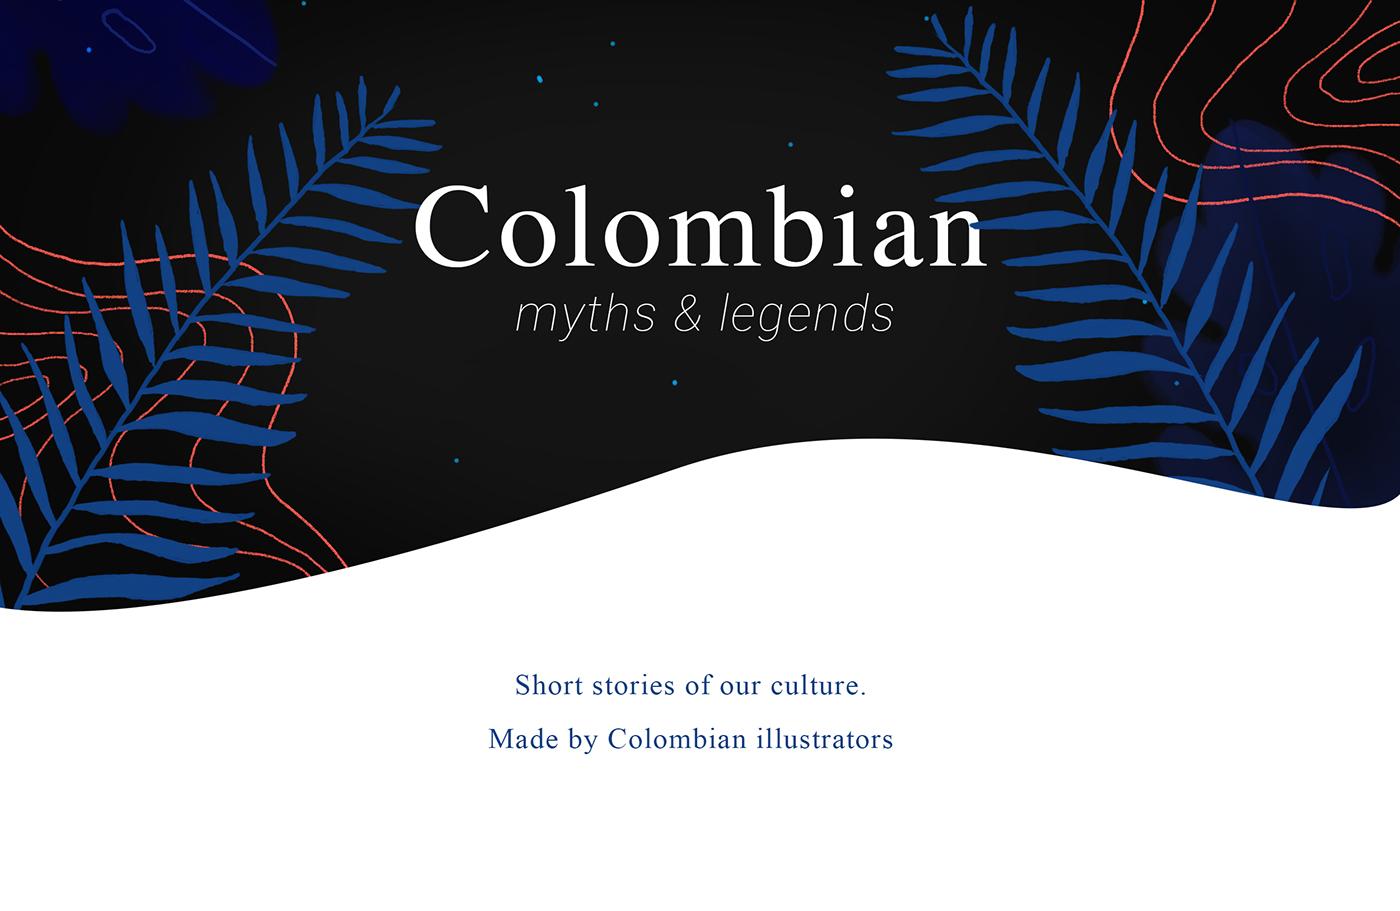 colombia myth legend mitos ILLUSTRATION  Latin culture LatinAmerica book